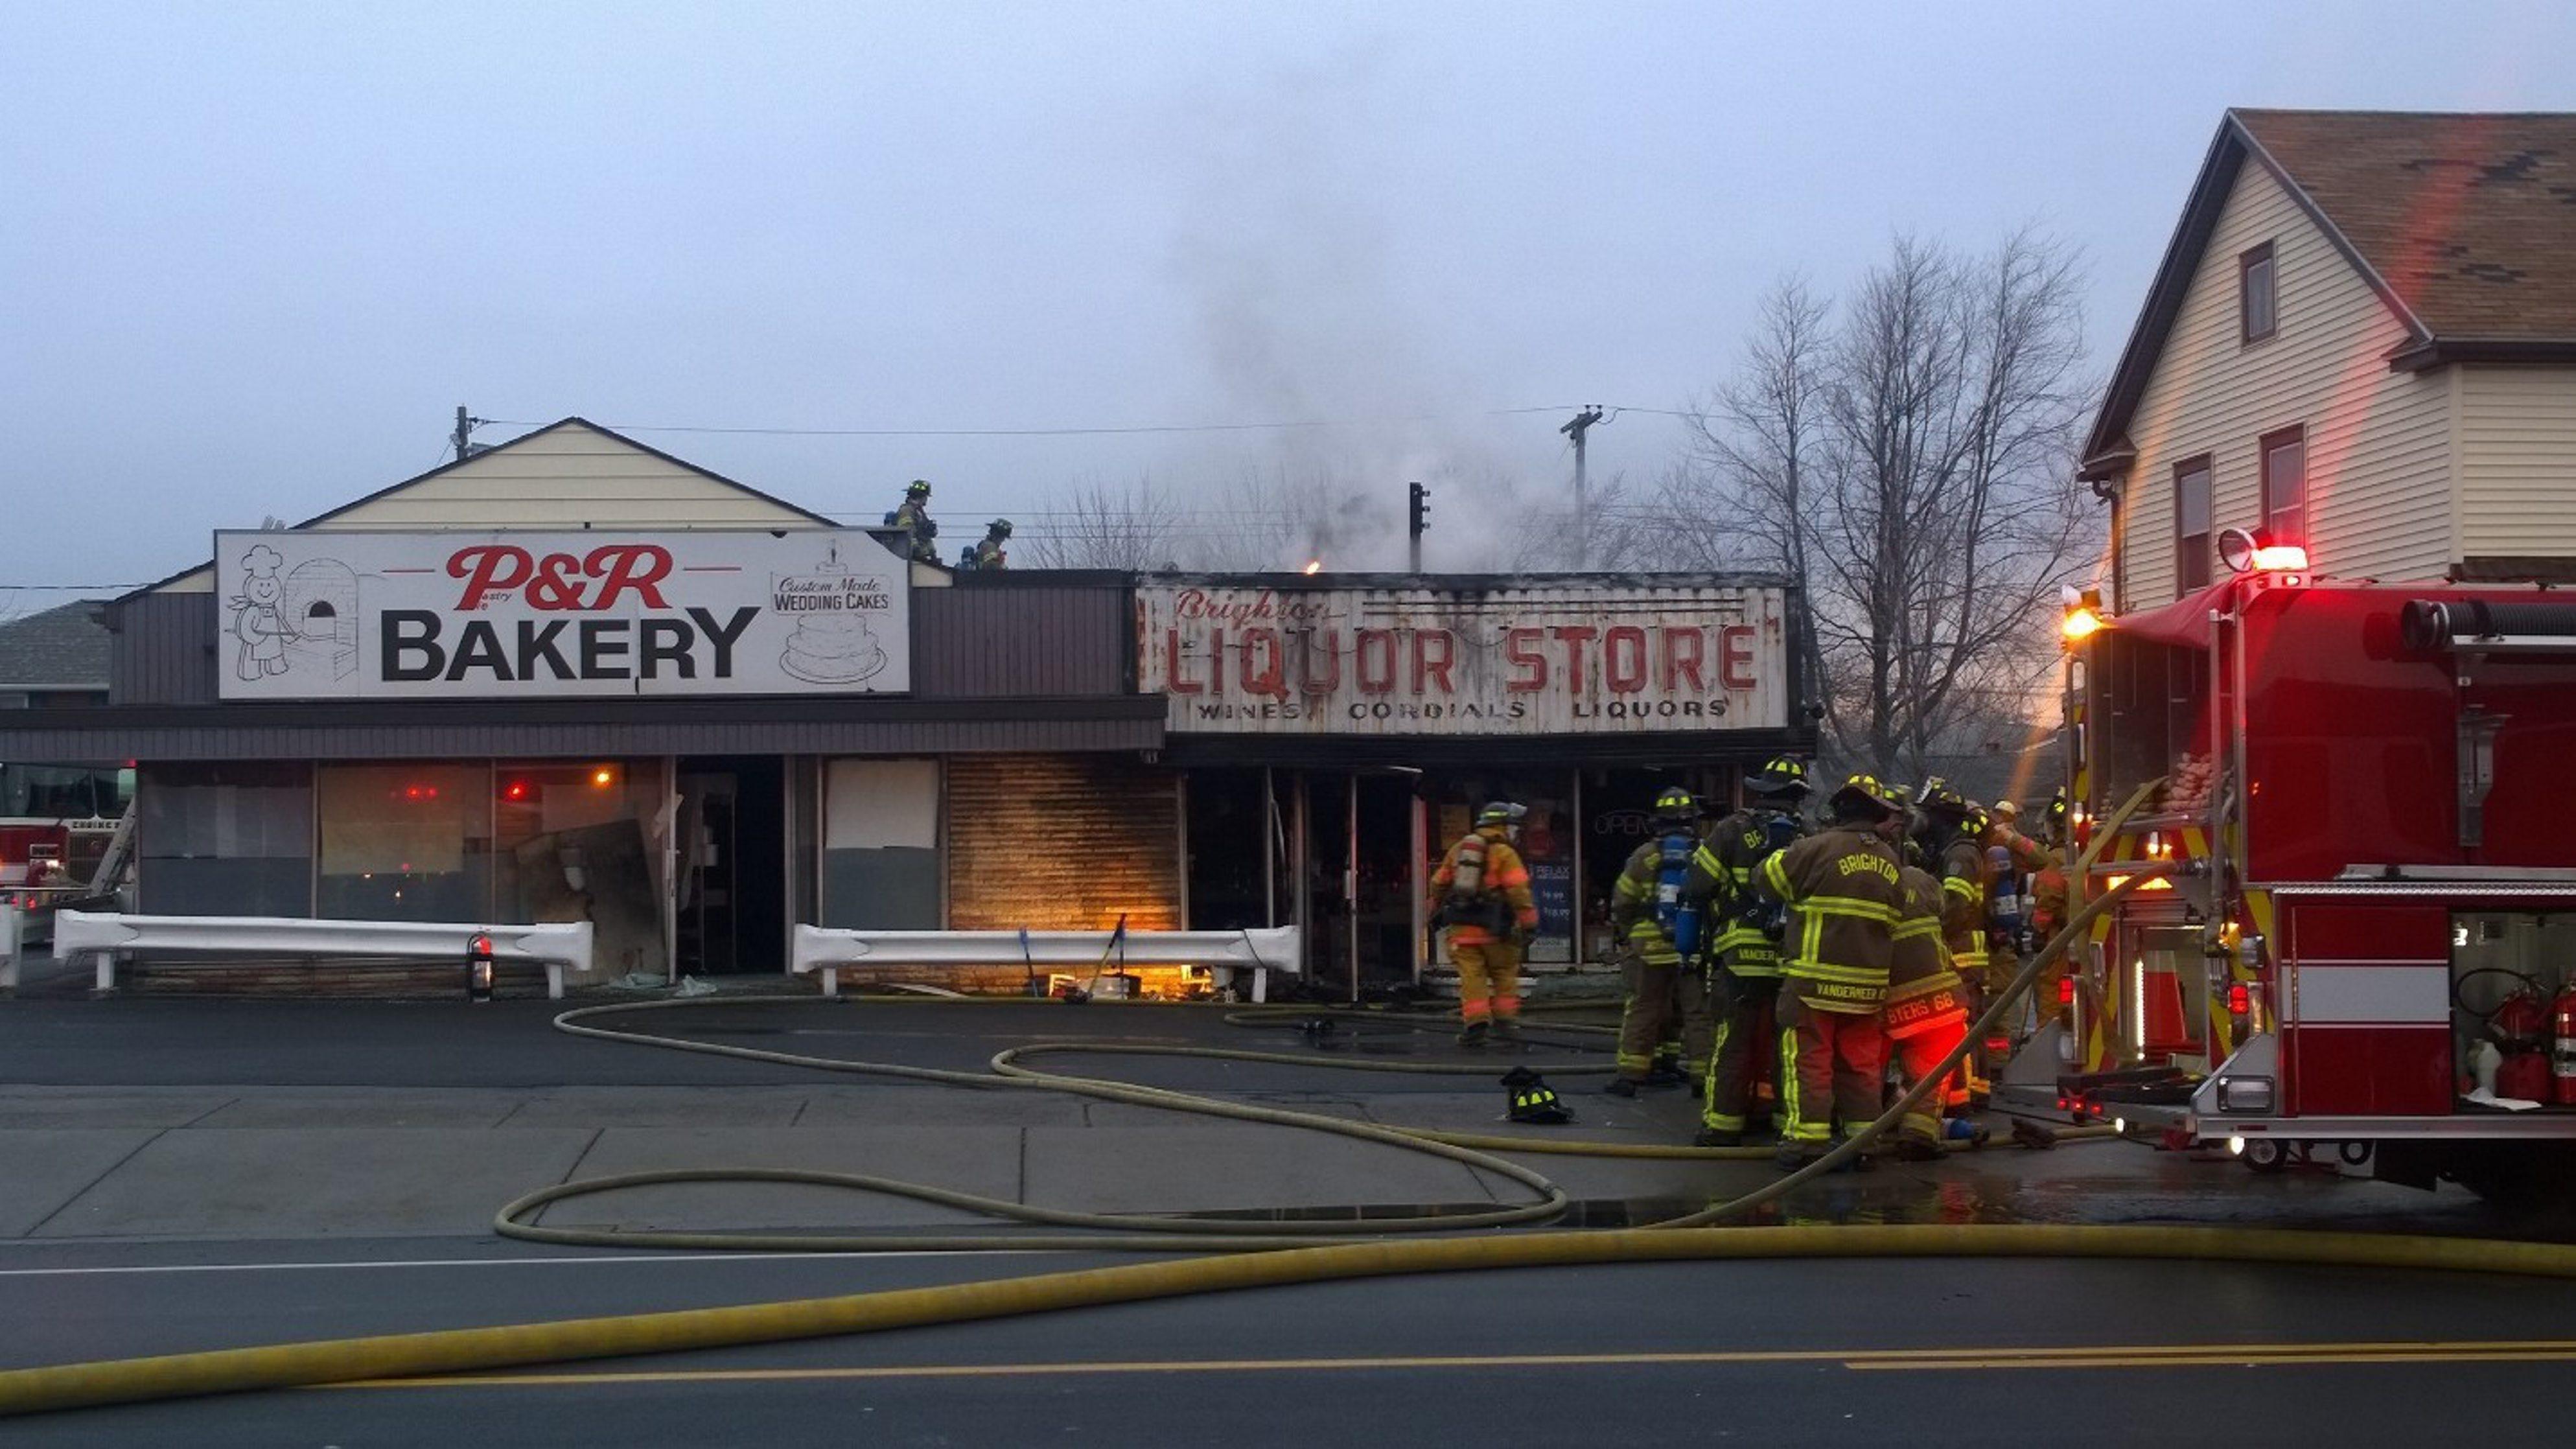 The scene at Sunday morning's fire at Brighton Liquor Store. (David Kazmierczak/Special to The News)